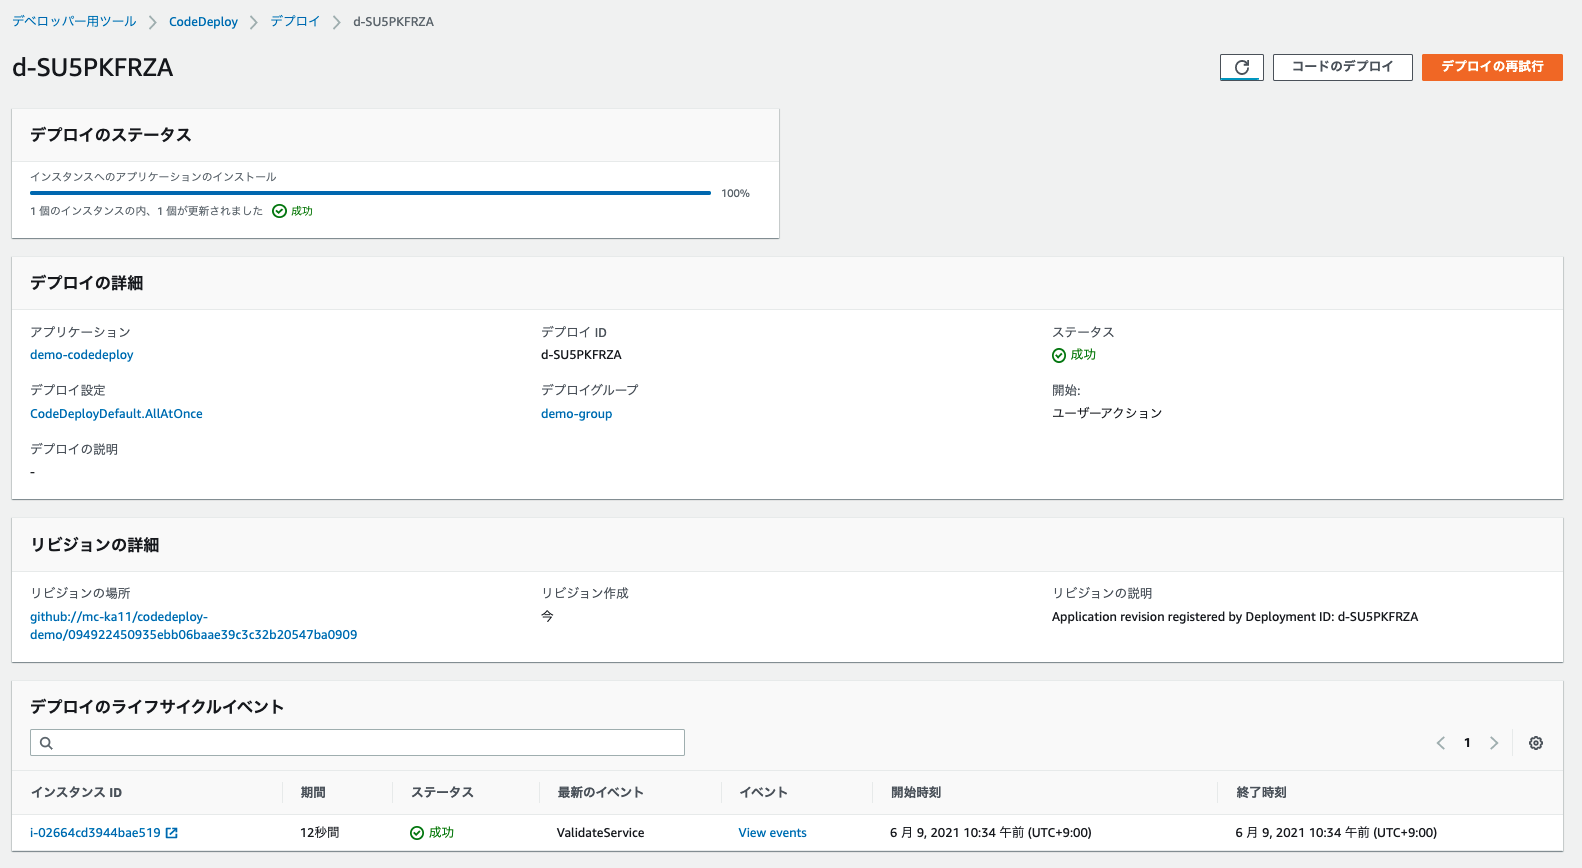 https://cdn-ssl-devio-img.classmethod.jp/wp-content/uploads/2021/06/2021-06-09_10.34.47.png